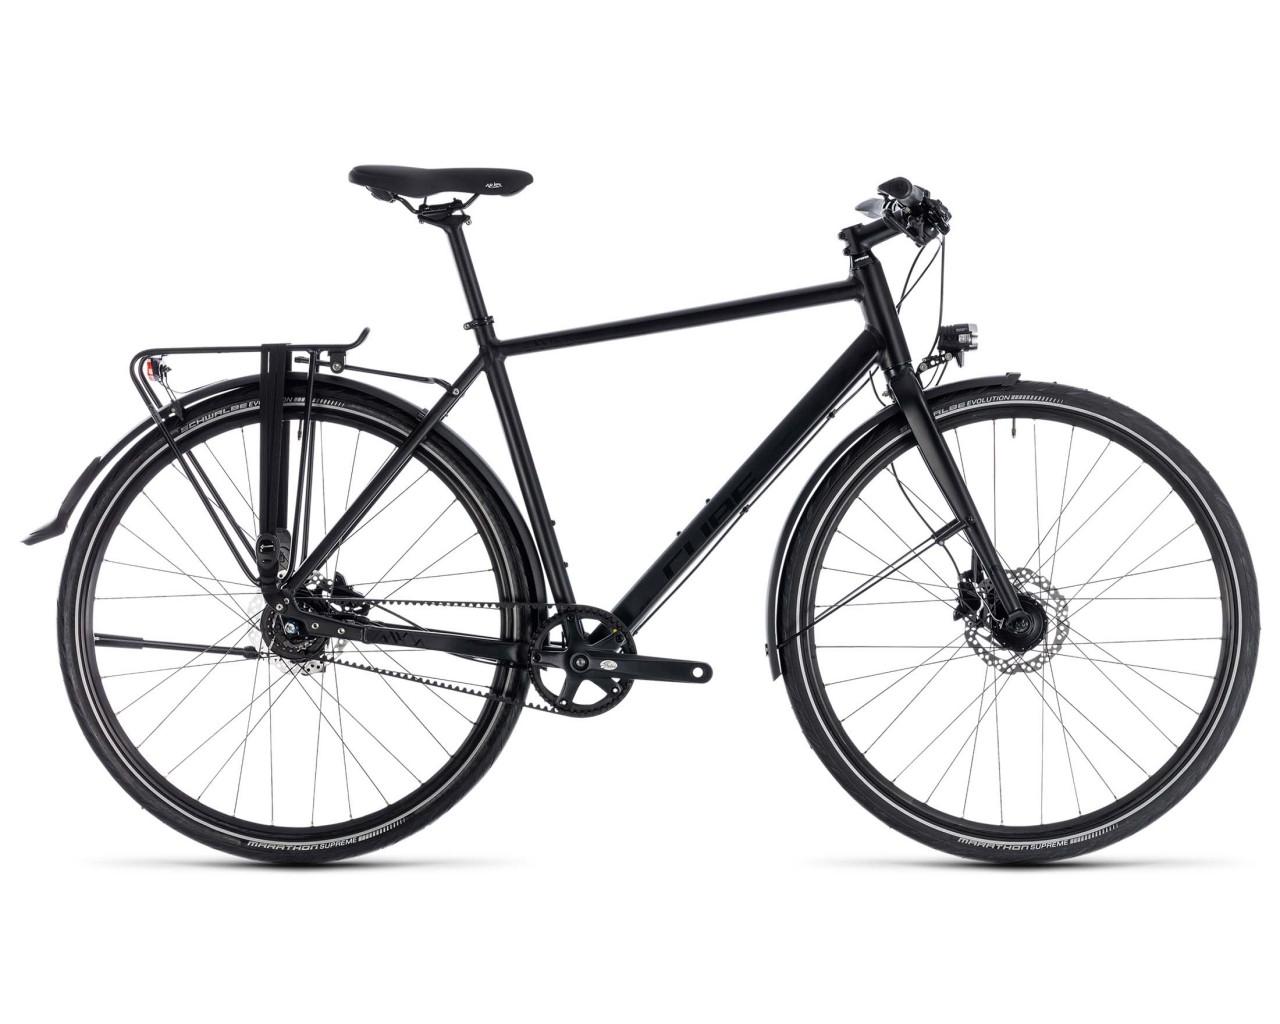 cube travel sl trekking fahrrad 2018 black n black. Black Bedroom Furniture Sets. Home Design Ideas